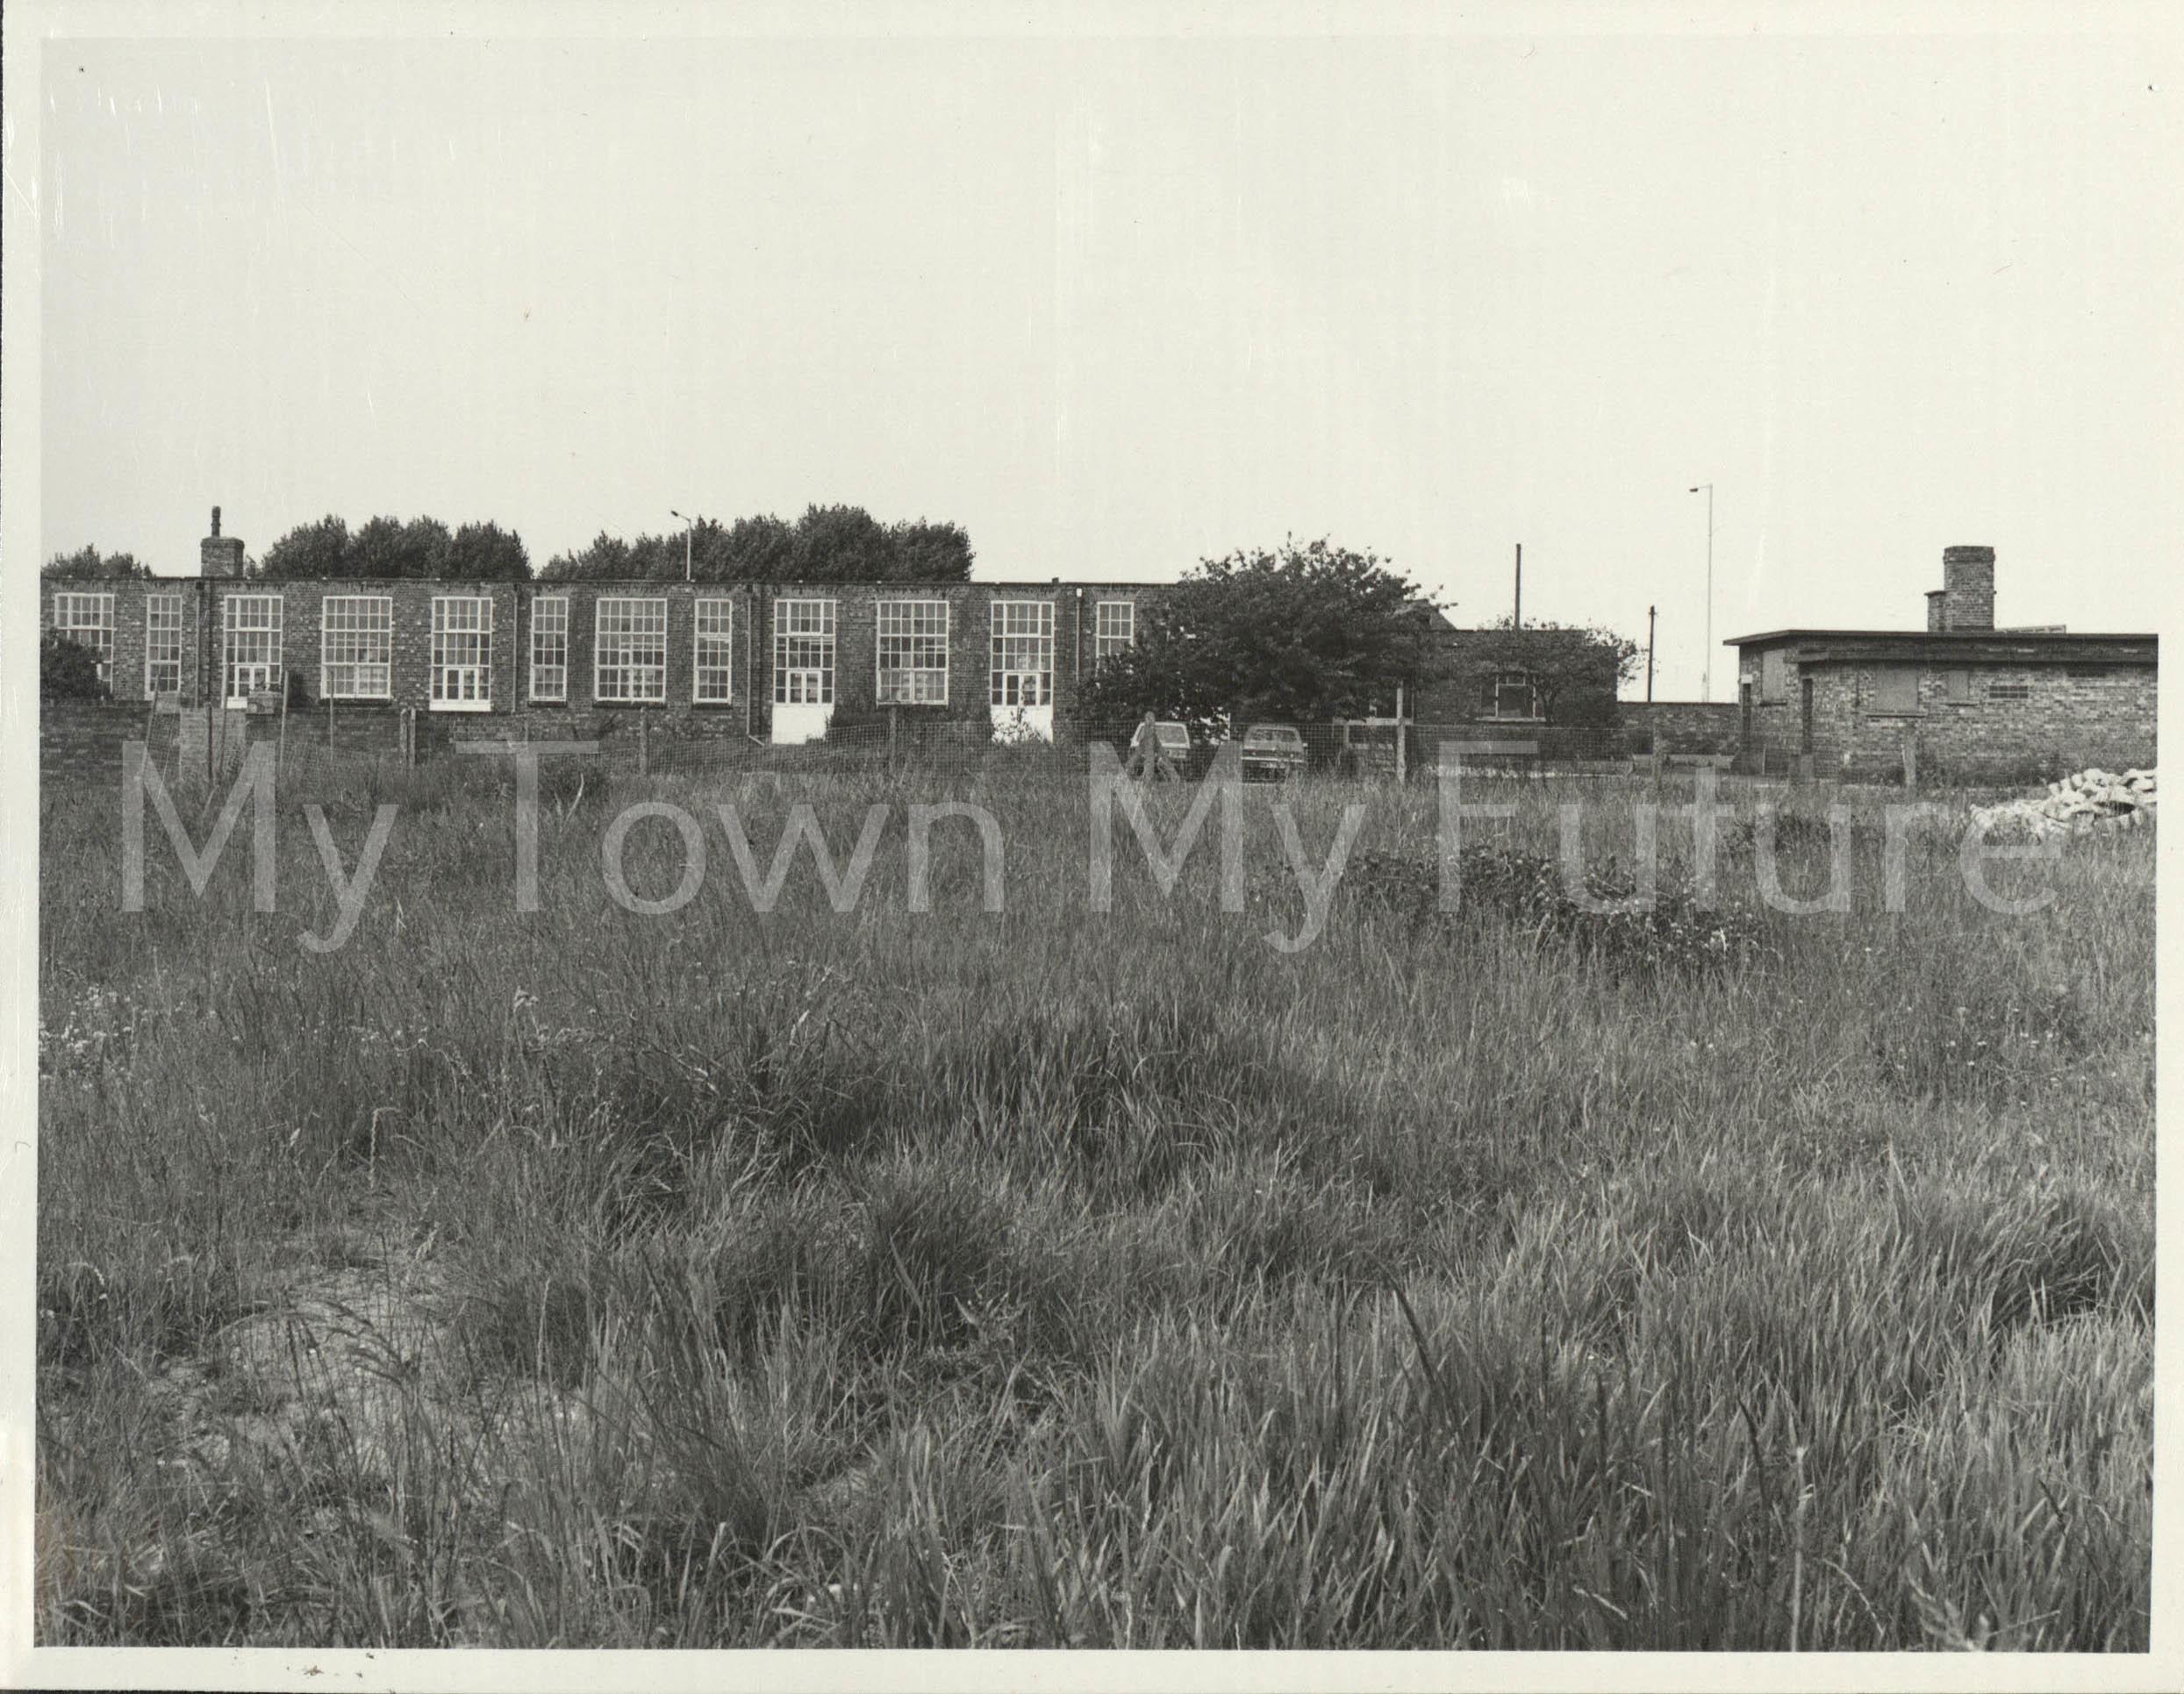 Lawson Infants School (June 1981).